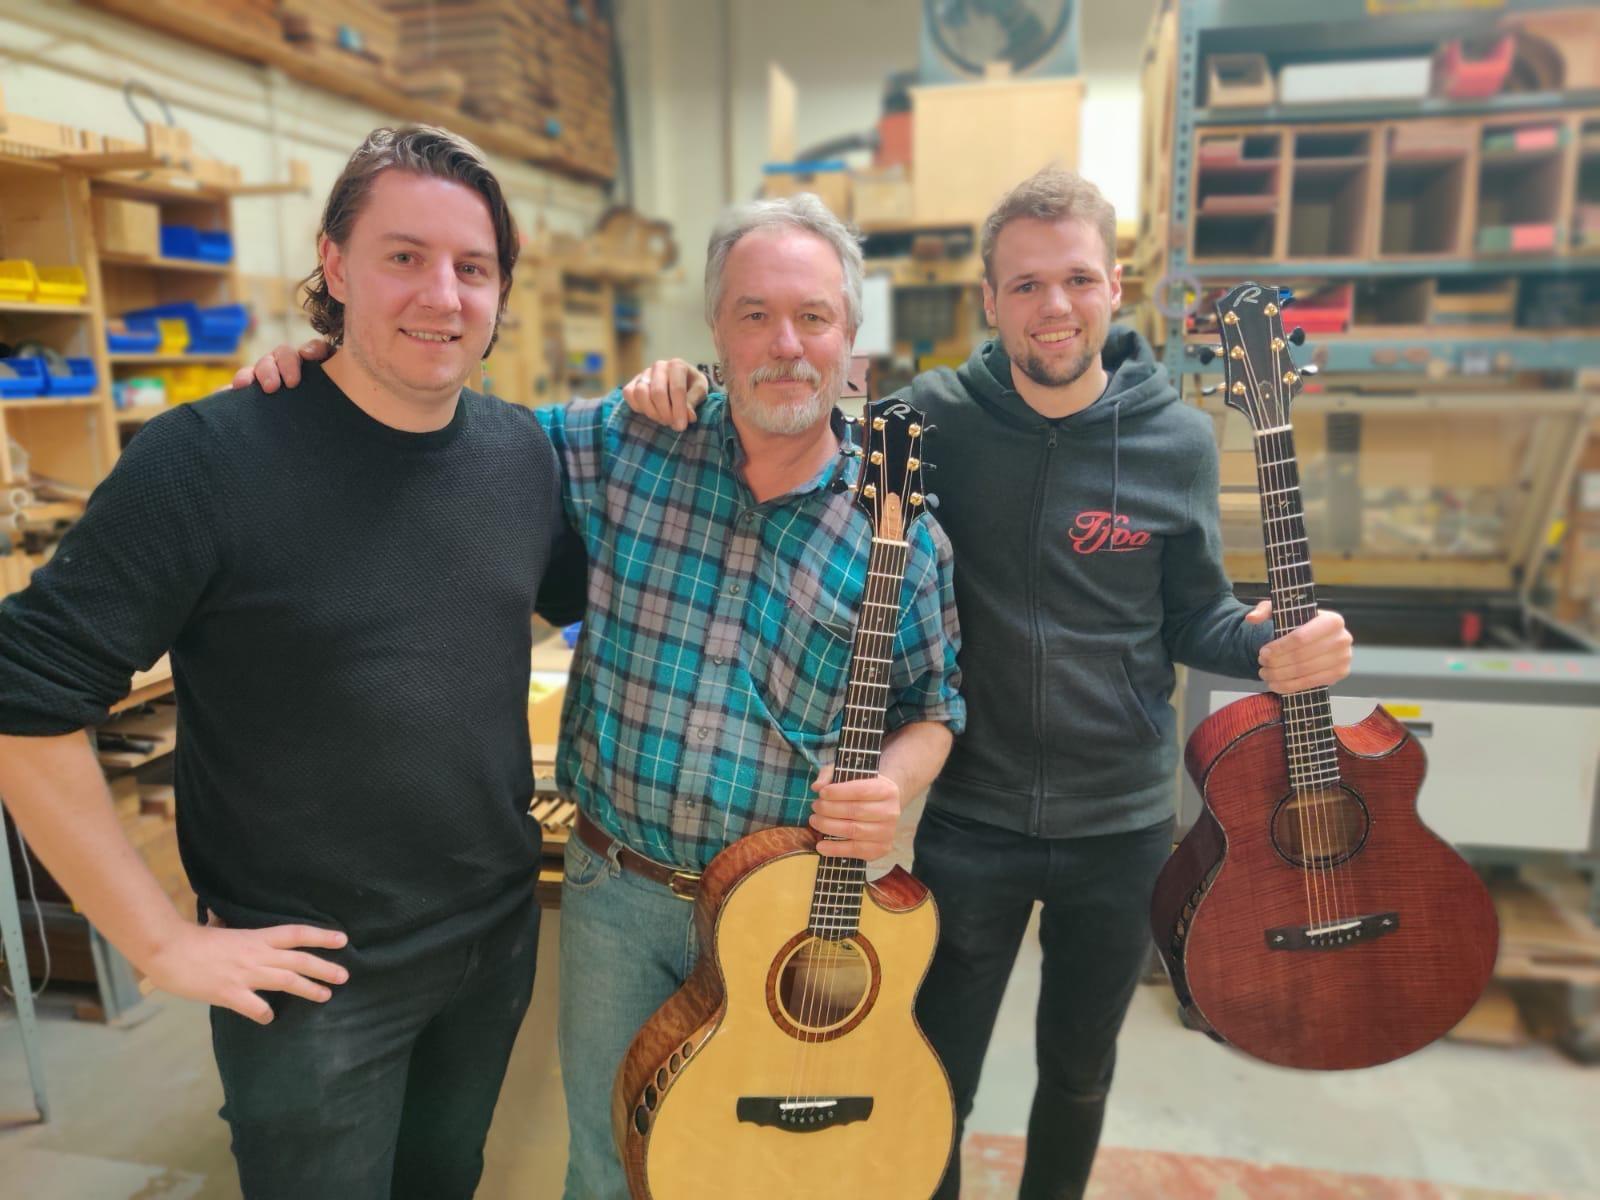 Visiting Kevin Ryan's Workshop in California!